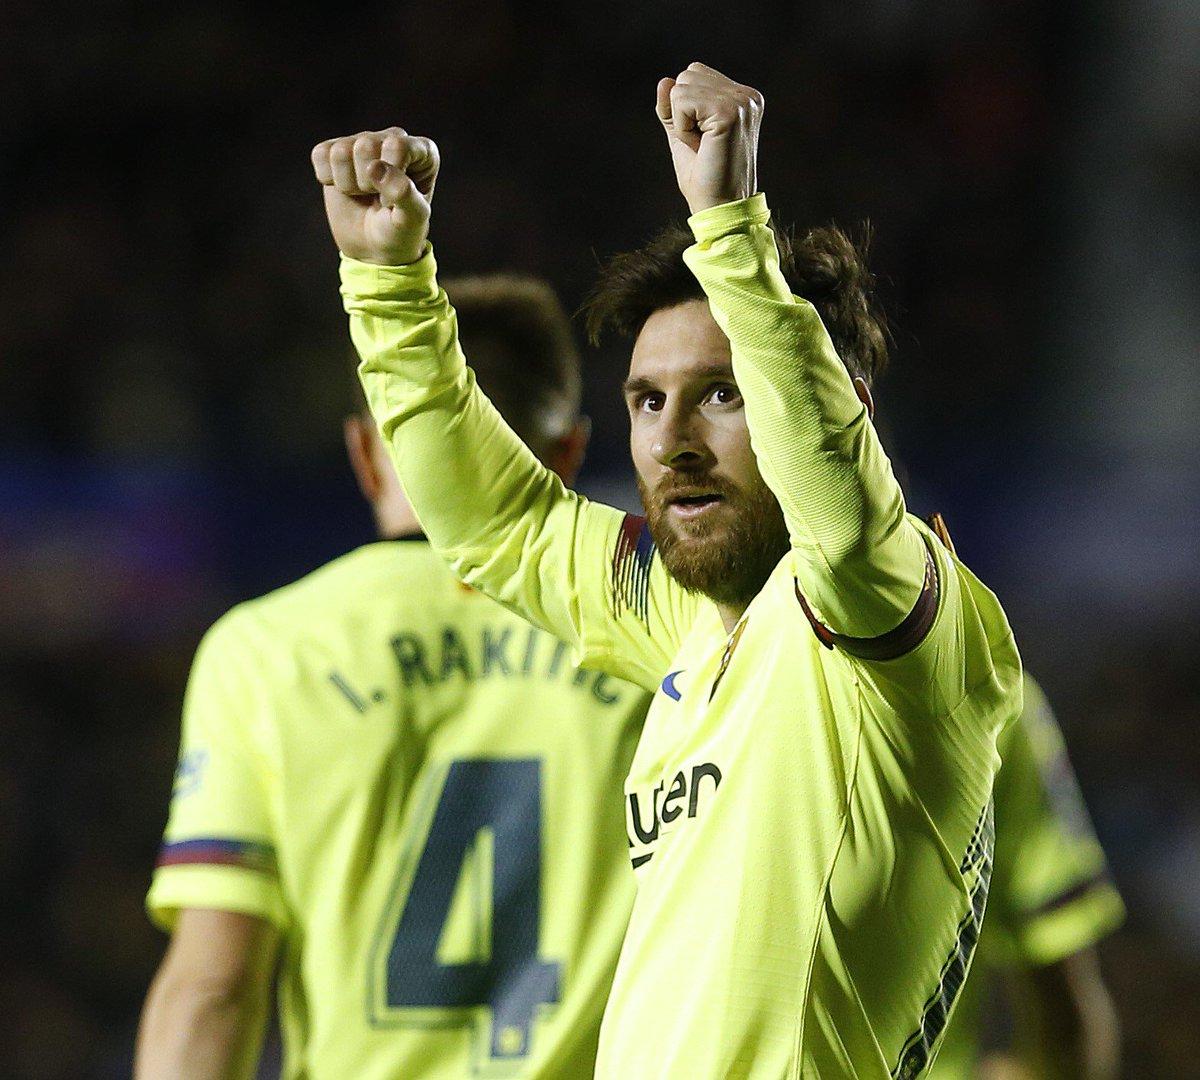 LaLiga's photo on Lionel Messi